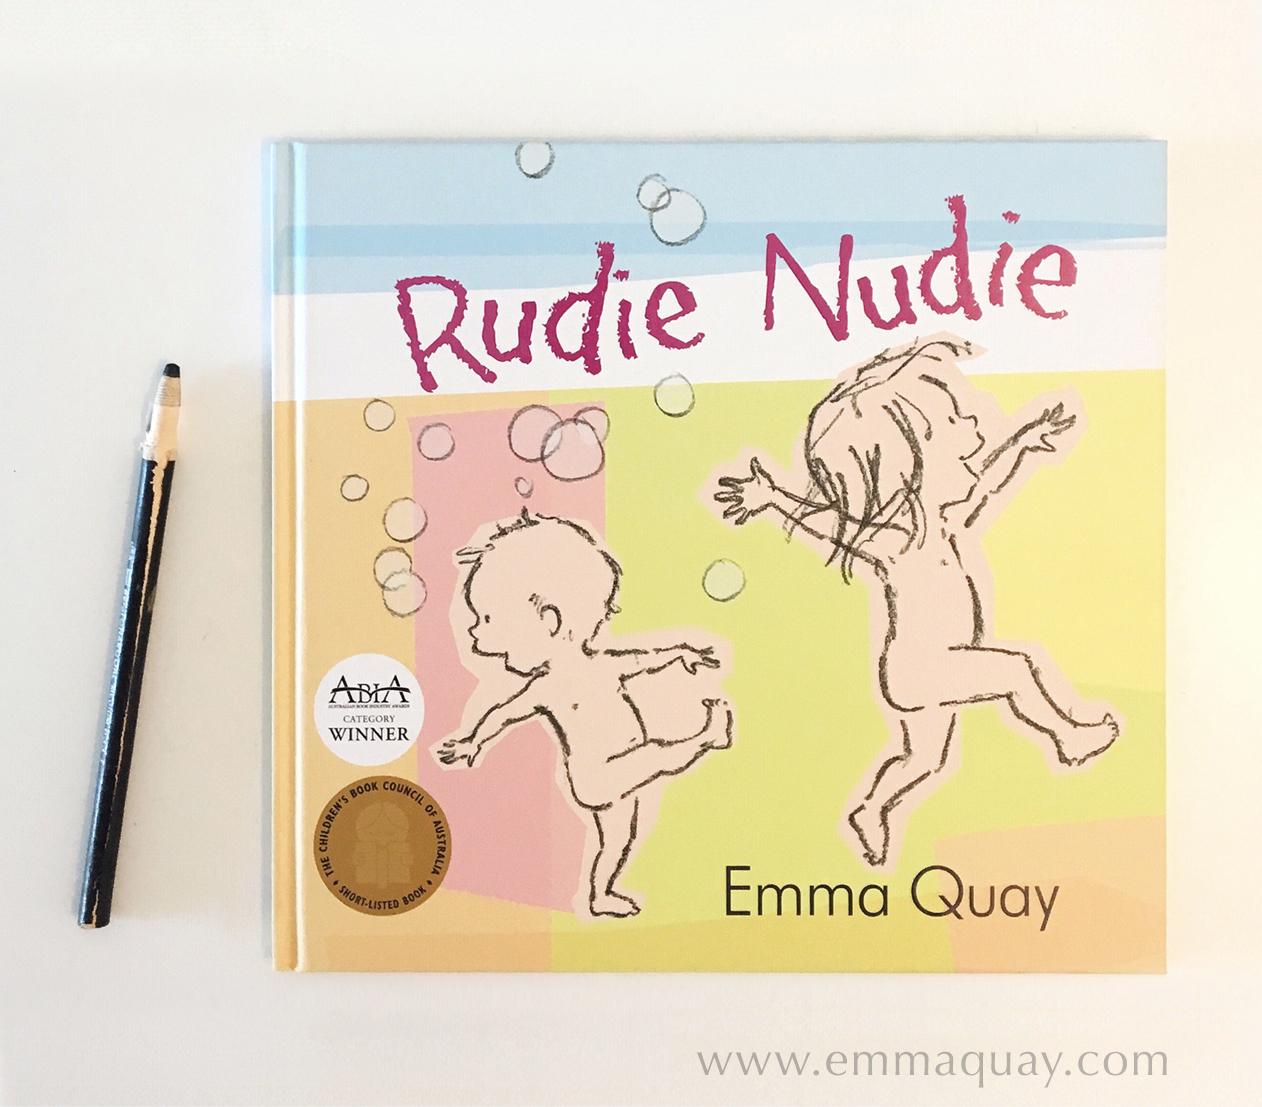 Getting published - RUDIE NUDIE by Emma Quay (ABC Books) www.emmaquay.com